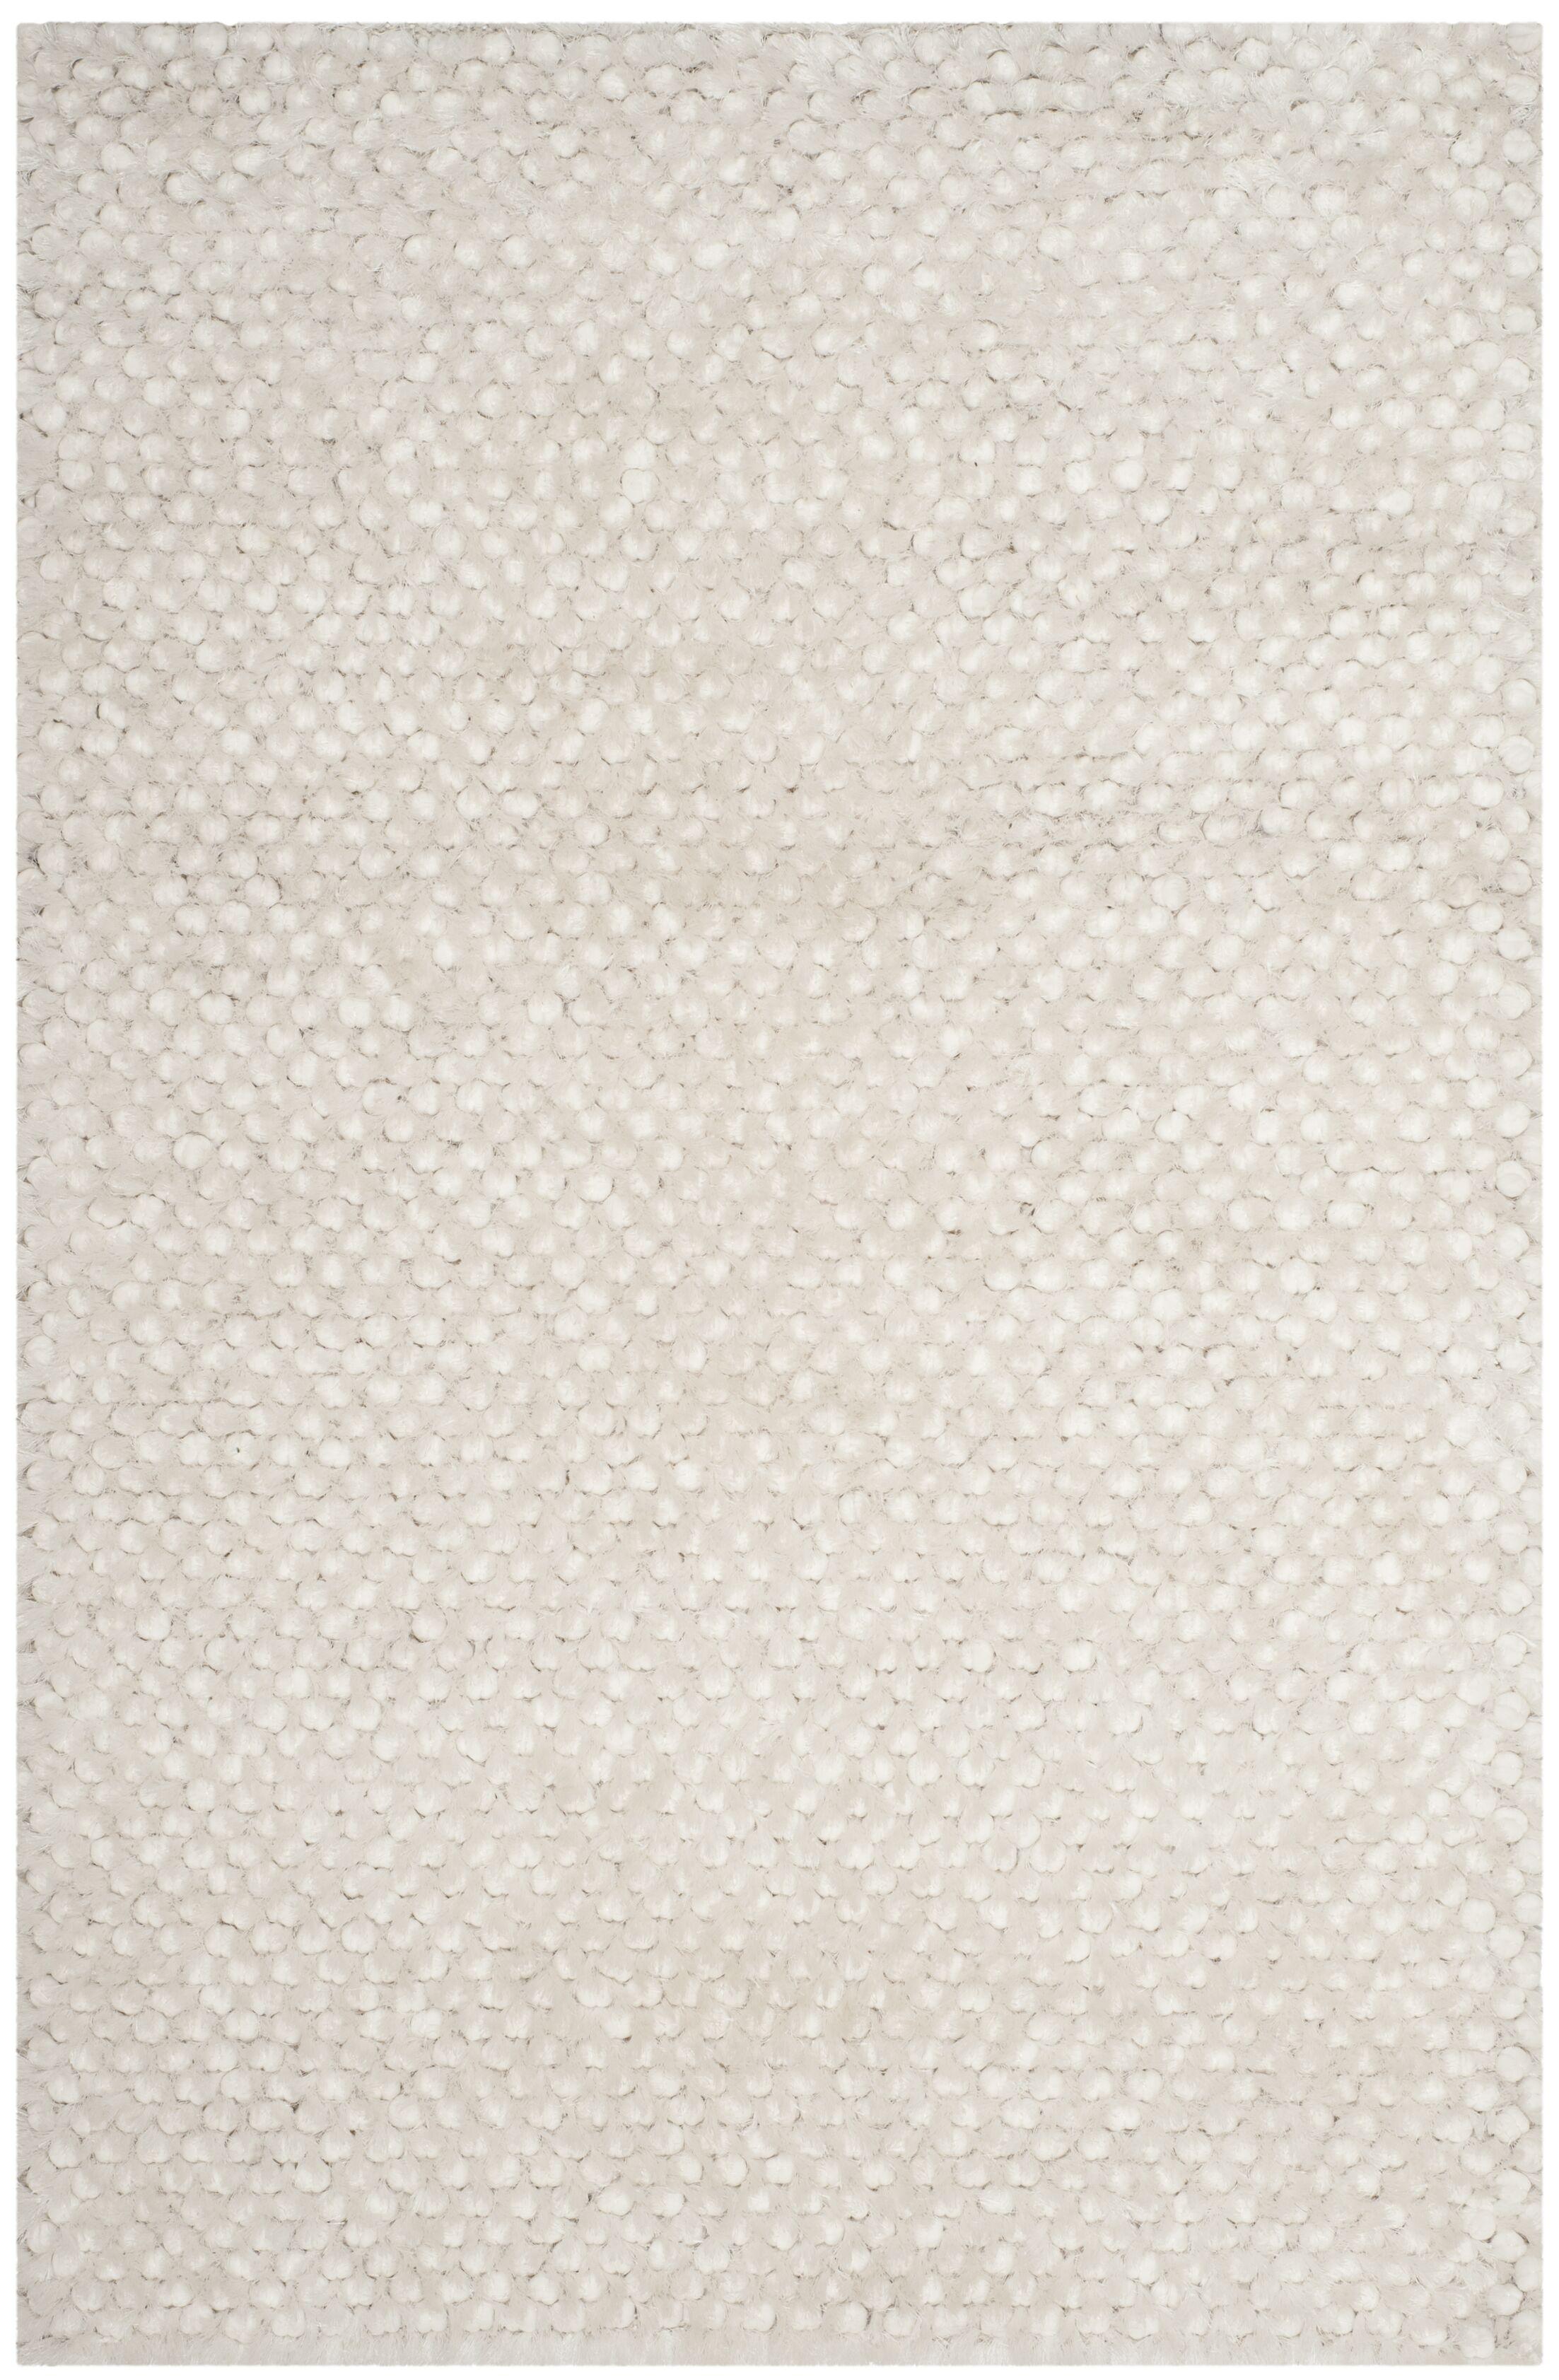 Saint Tropez Hand Woven Cotton White Area Rug Rug Size: Rectangle 4' x 6'